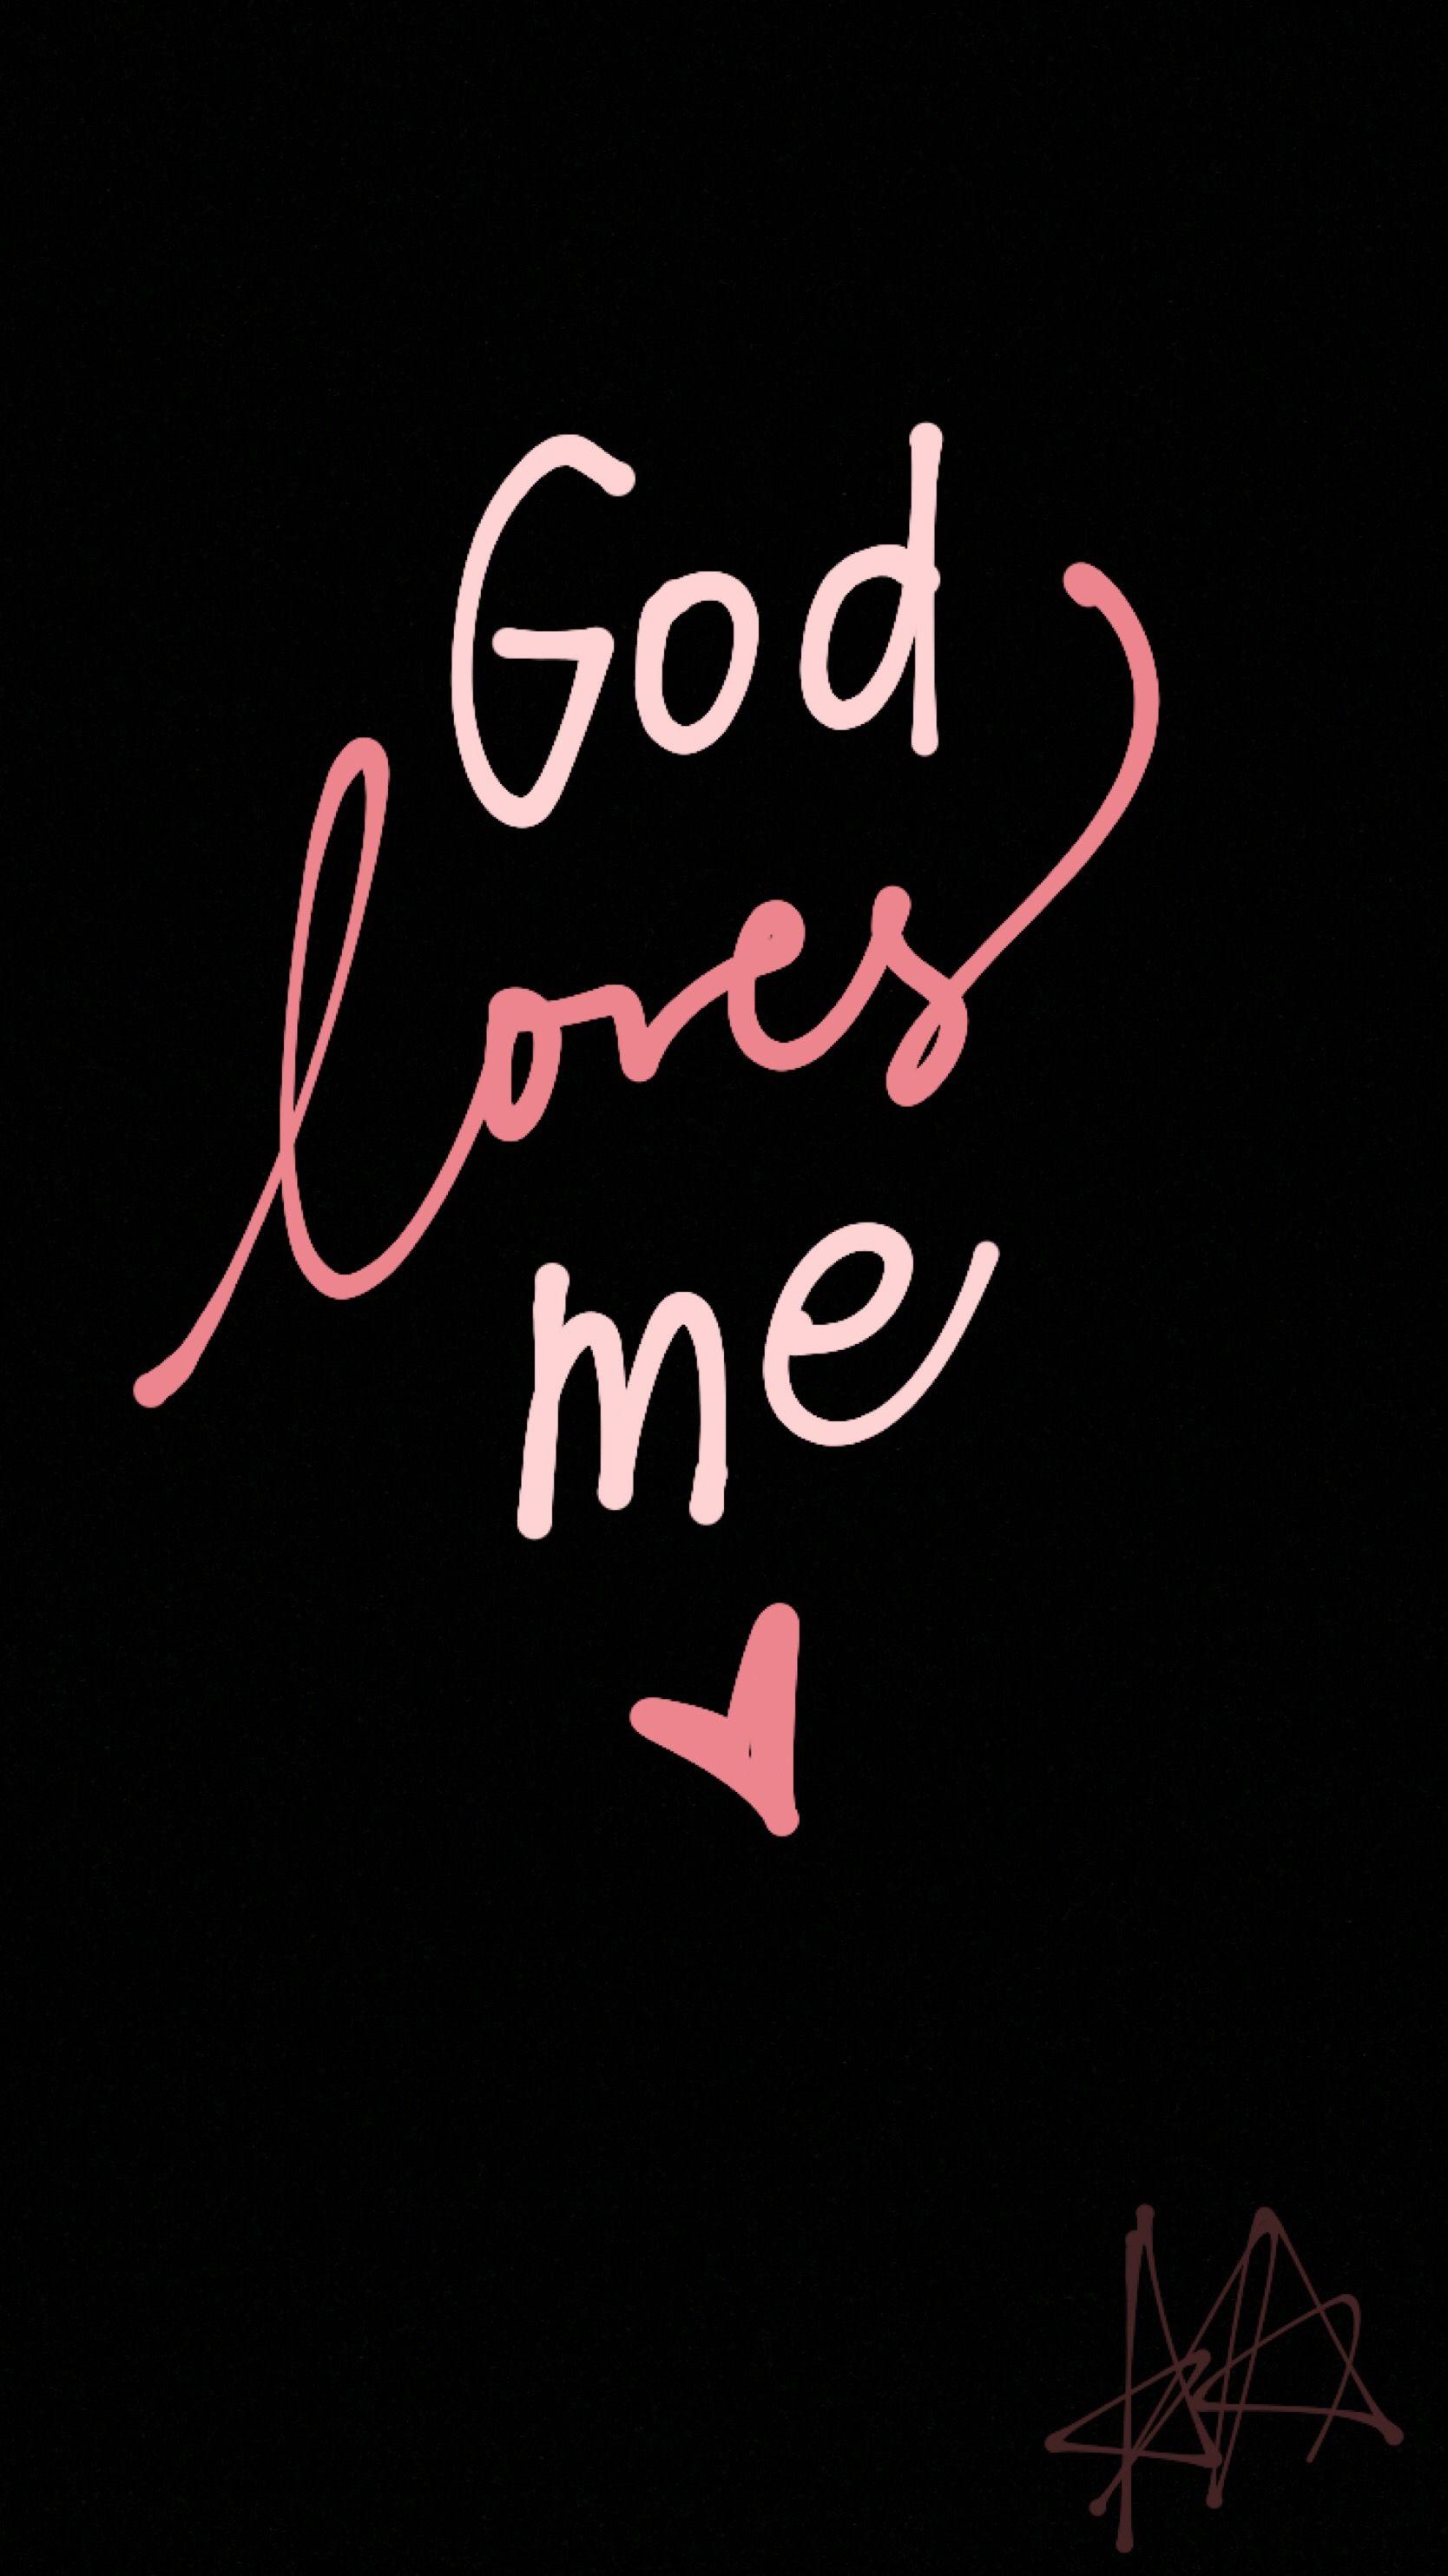 Jesus Loves Me Wallpaper : jesus, loves, wallpaper, Loves, Quotes, Wallpaper,, Iphone, Wallpaper, Bible,, Bible, Words